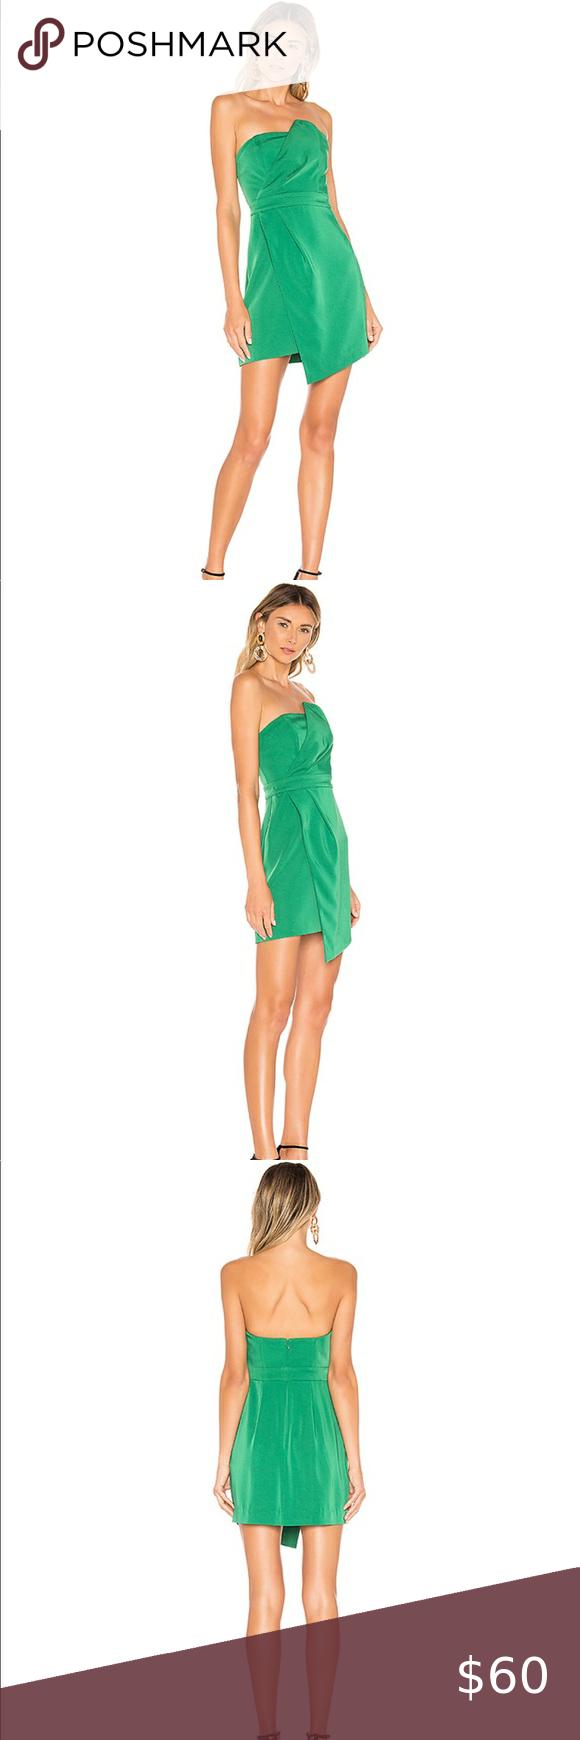 Check out this listing I just found on Poshmark: NBD Mataya Bodycon Dress in Kelly Green. #shopmycloset #poshmark #shopping #style #pinitforlater #NBD #Dresses & Skirts